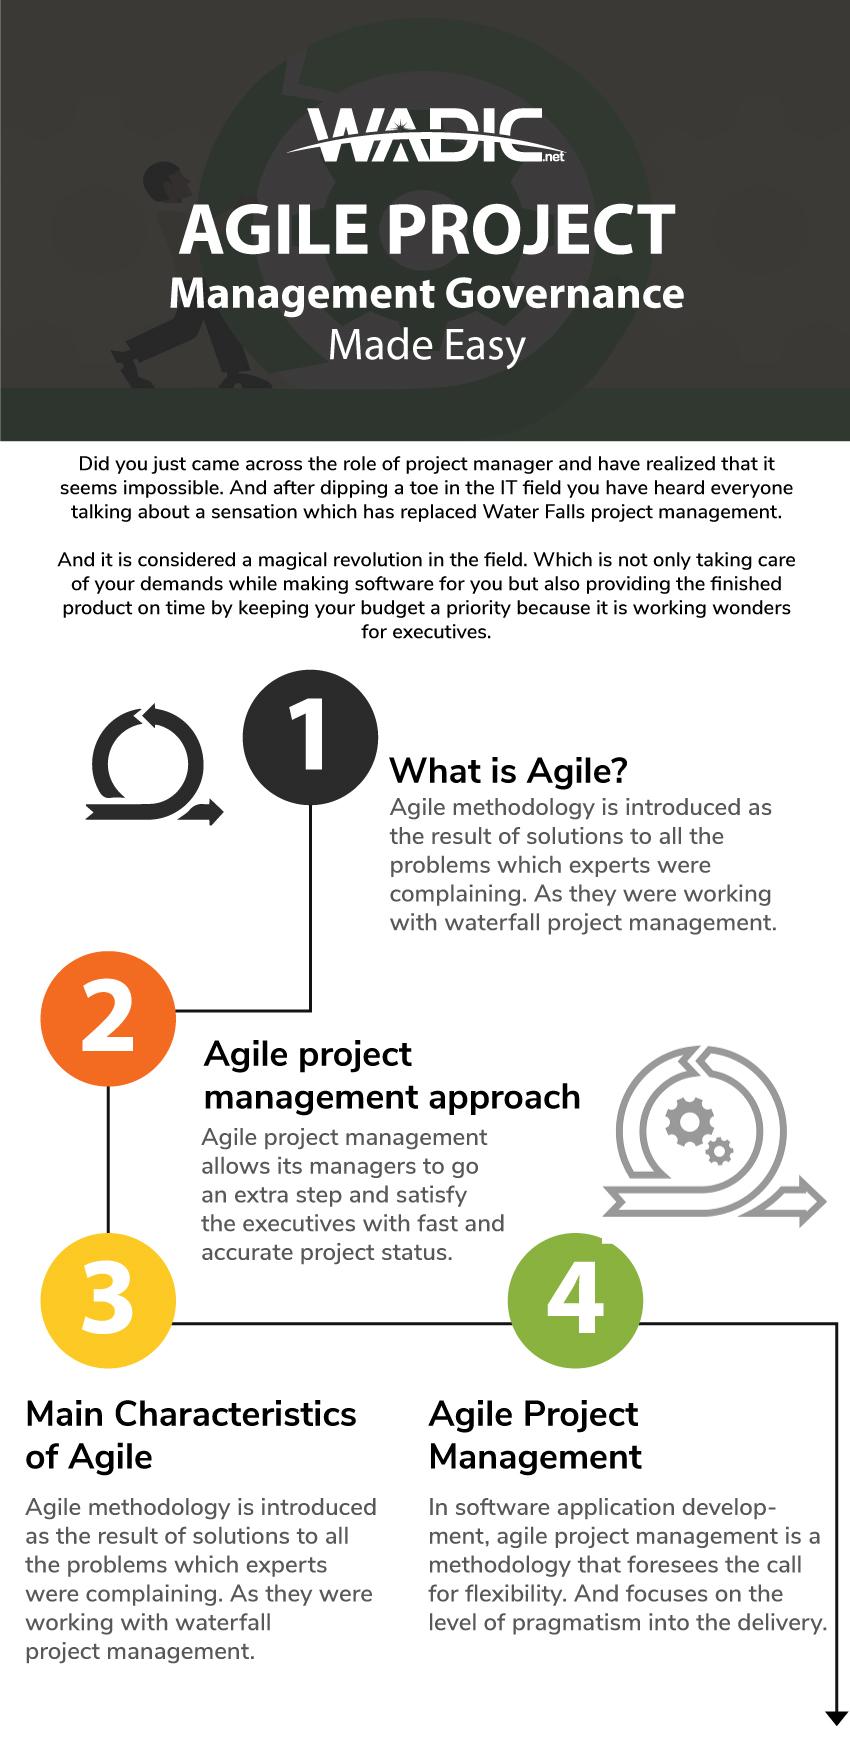 Governance of agile project methodologes